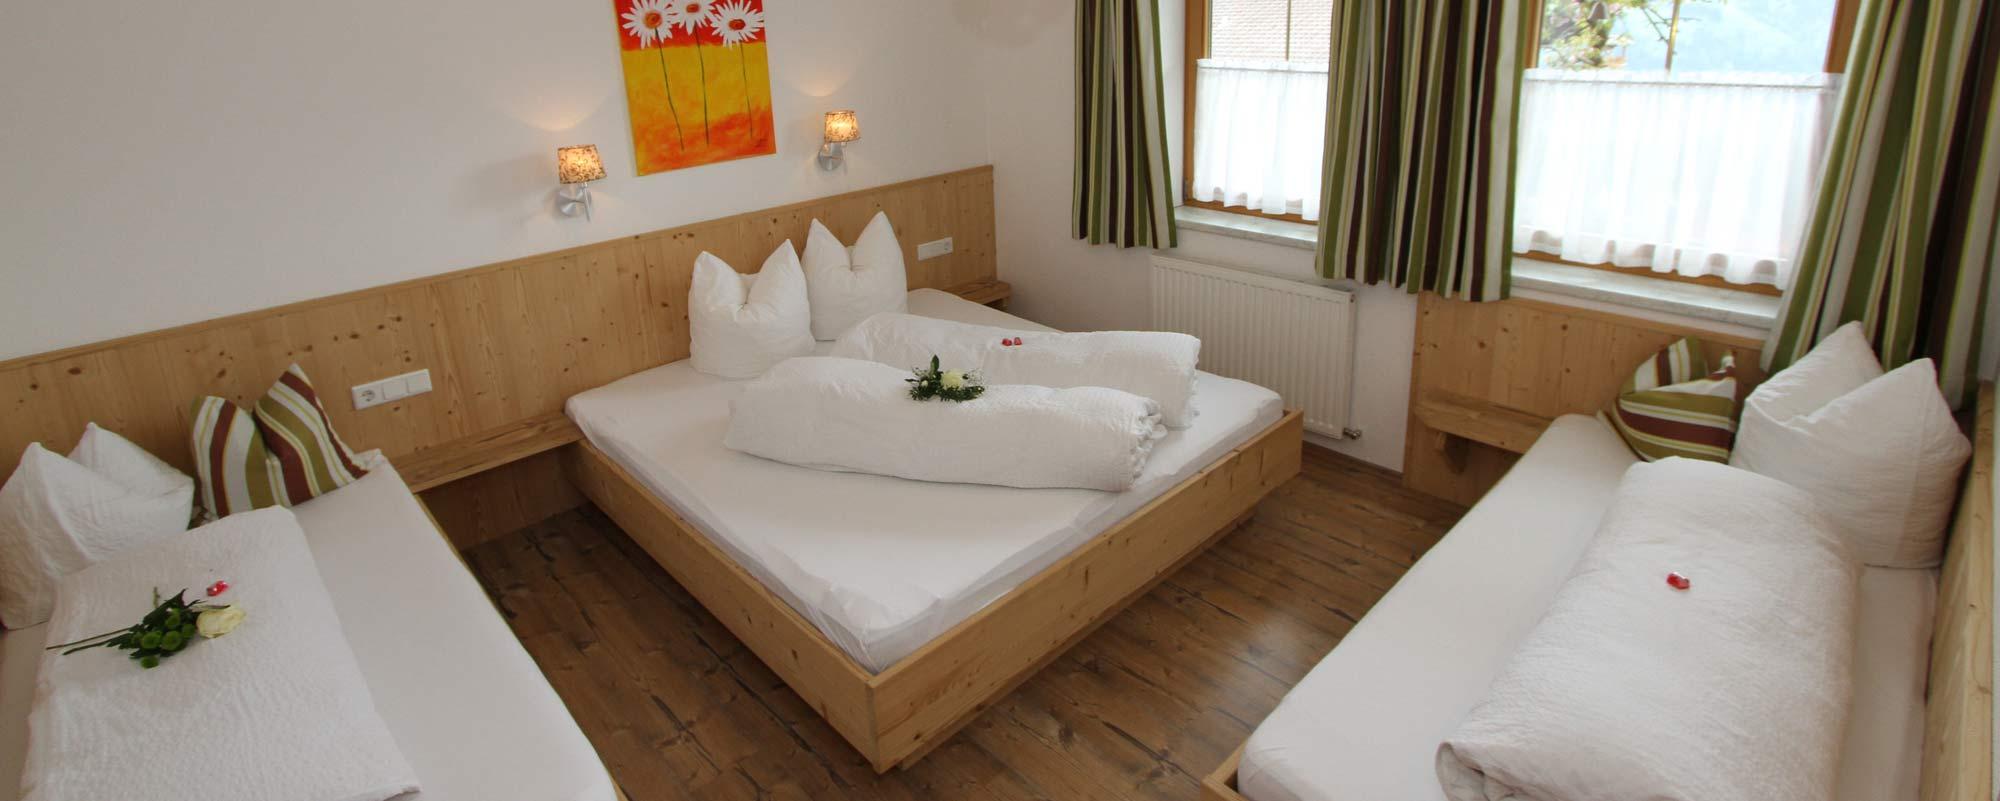 Apartment Sonne Schlafzimmer 4 Bett Zimmer in Holzoptik